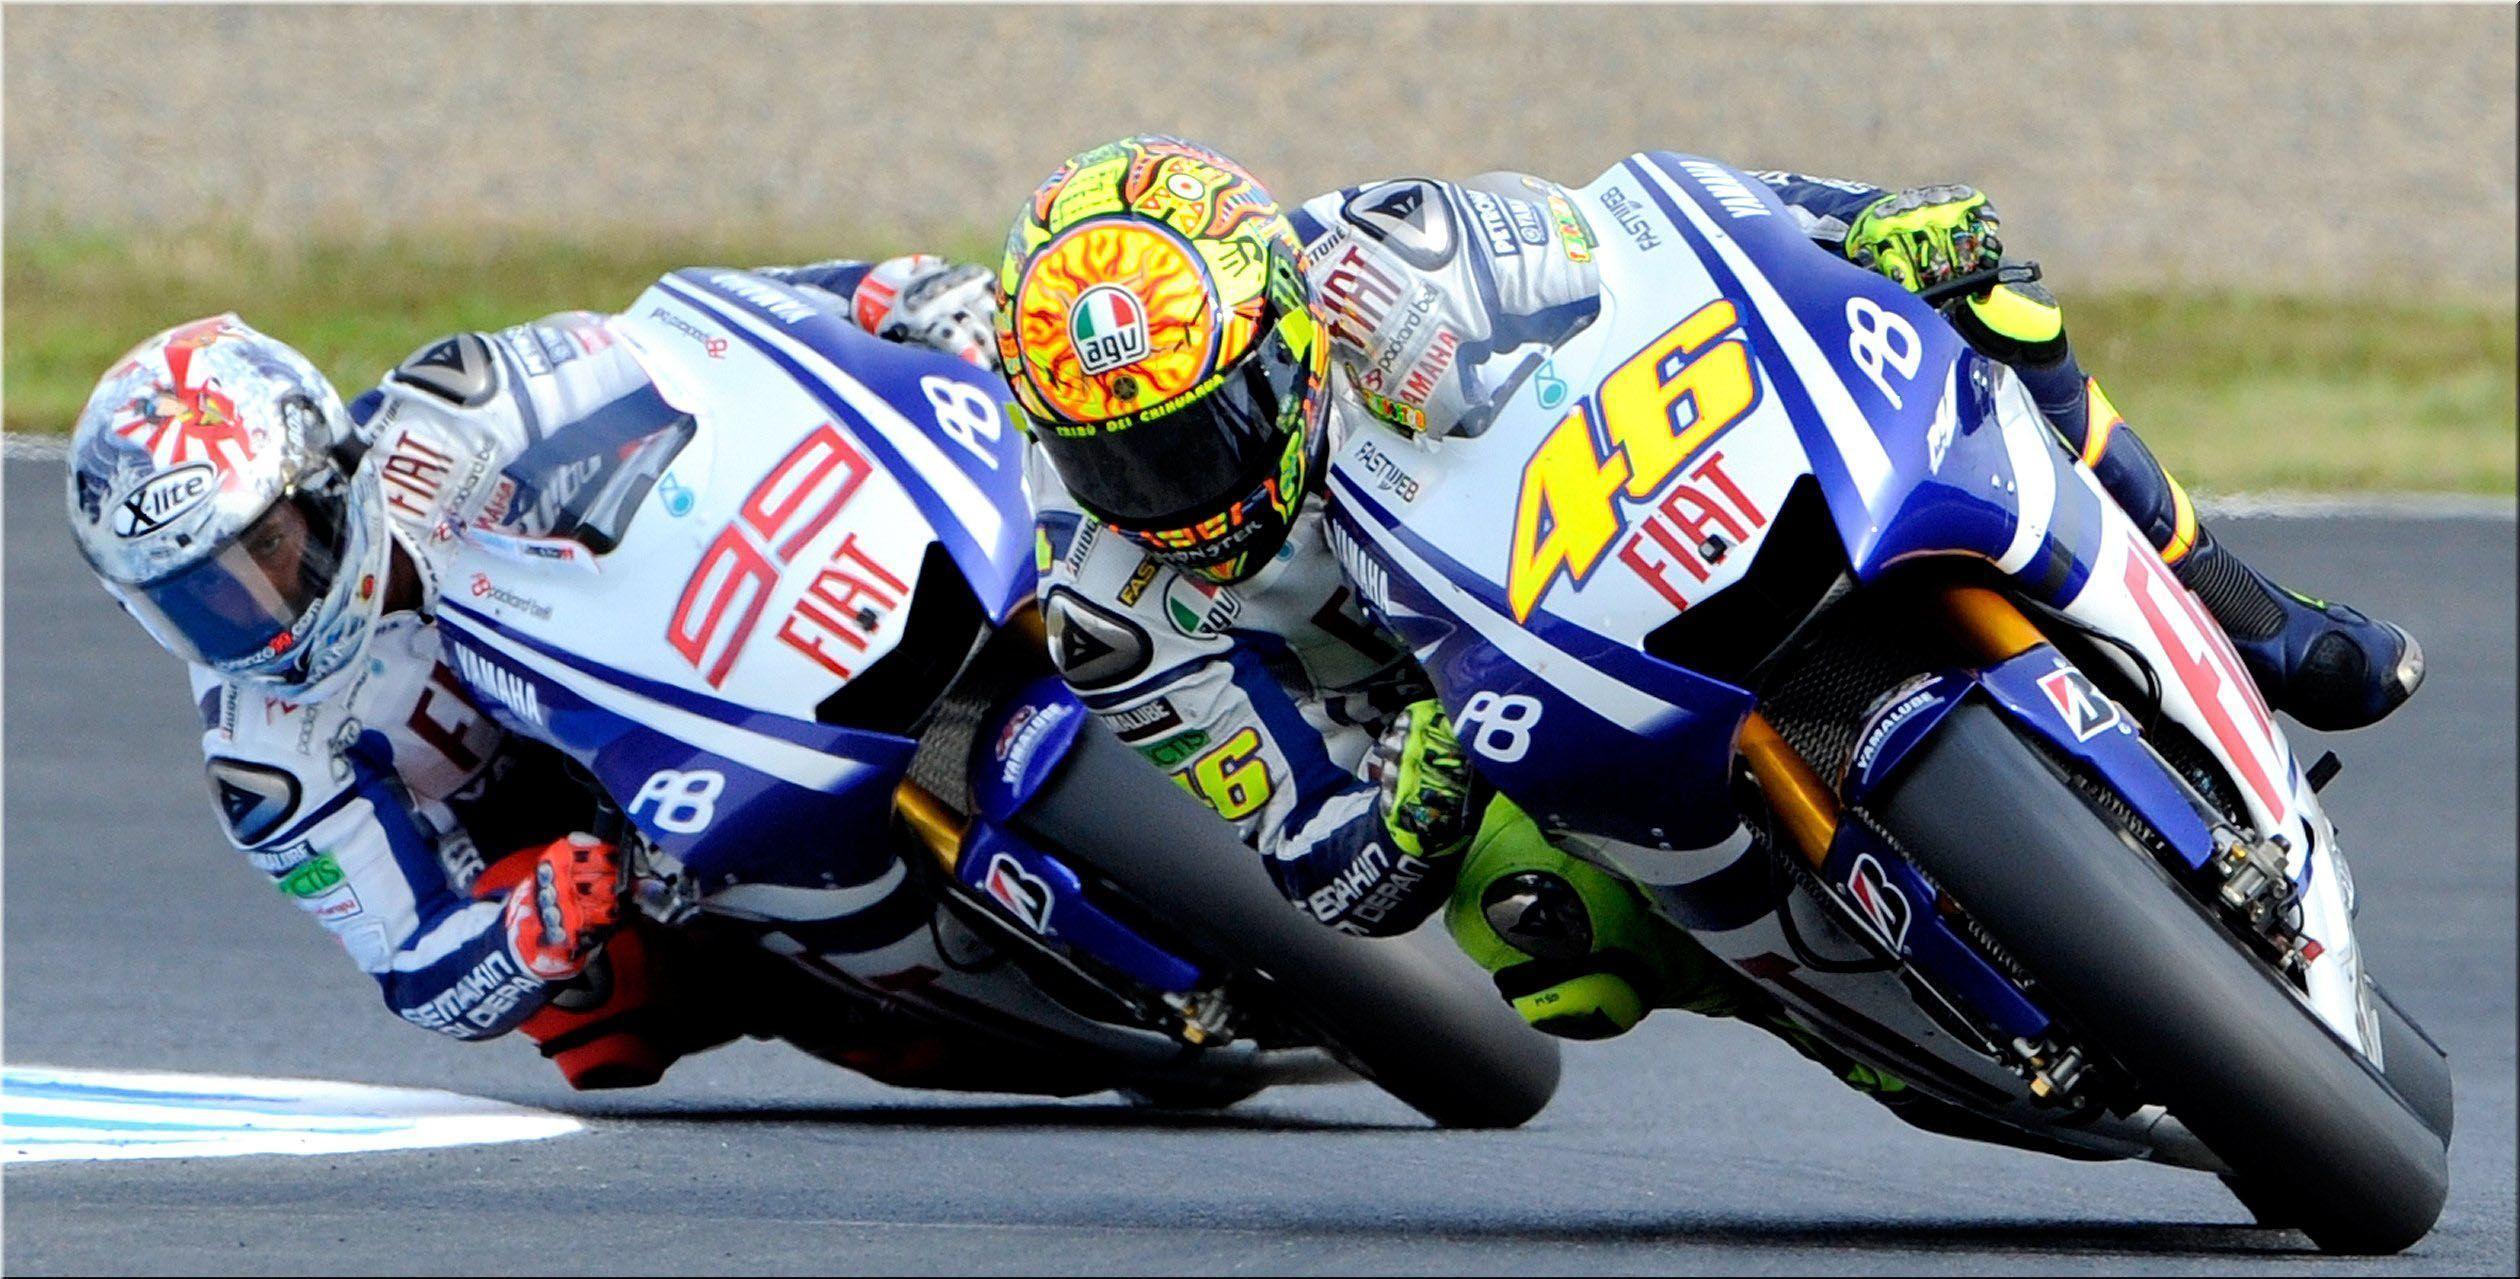 Valentino Rossi Hd Wallpaper: Moto GP Wallpapers